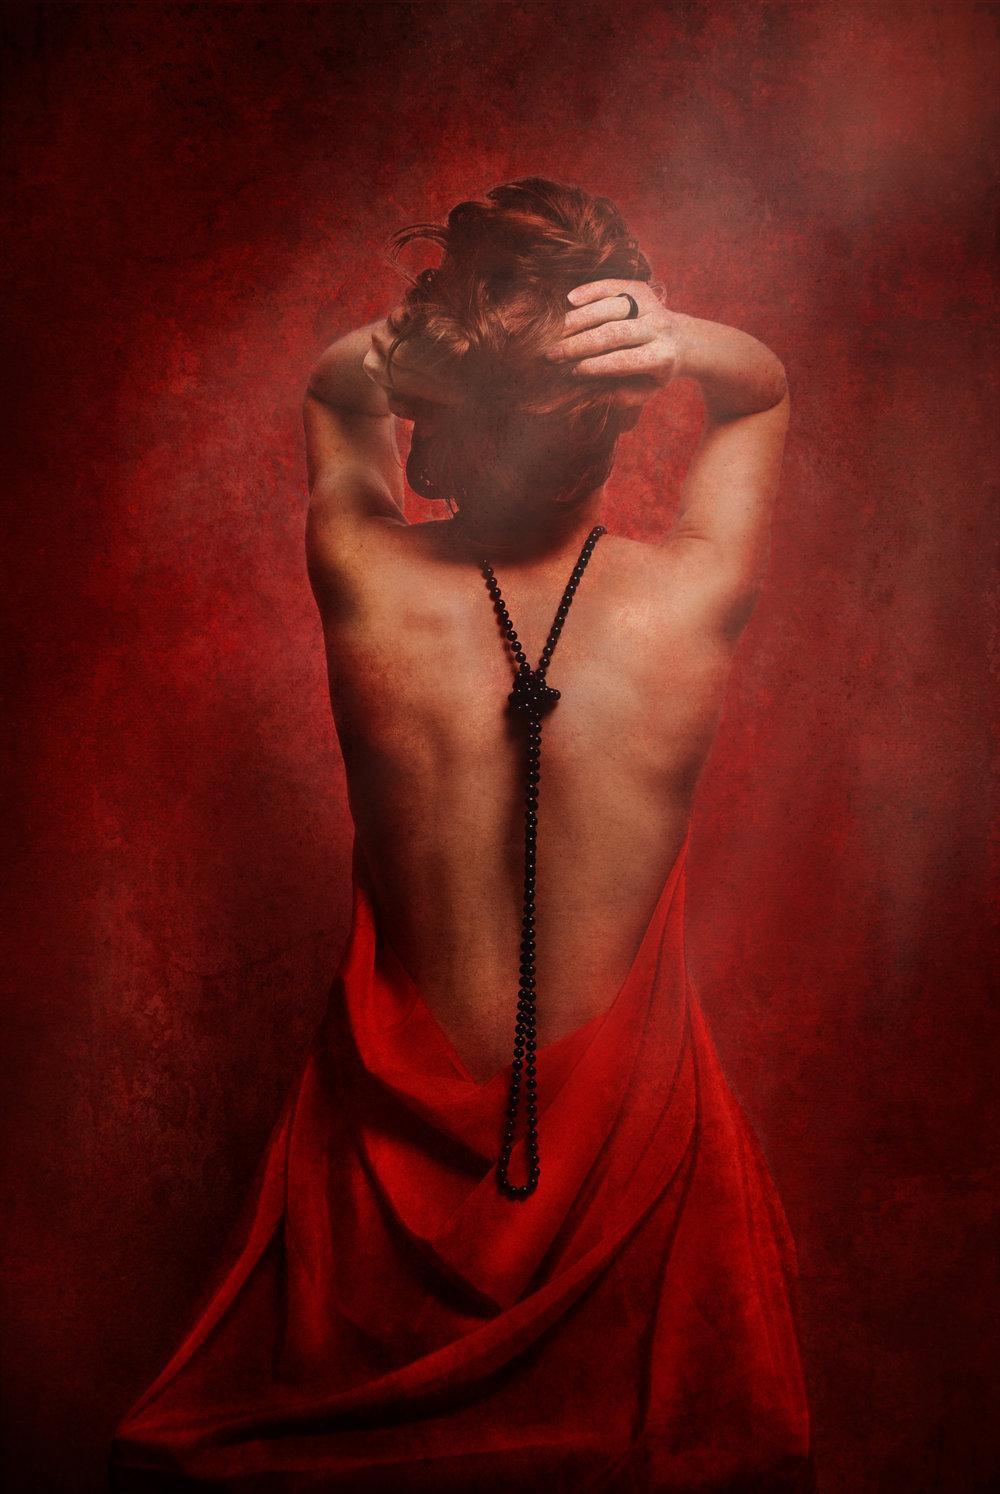 SHE is sensuality -